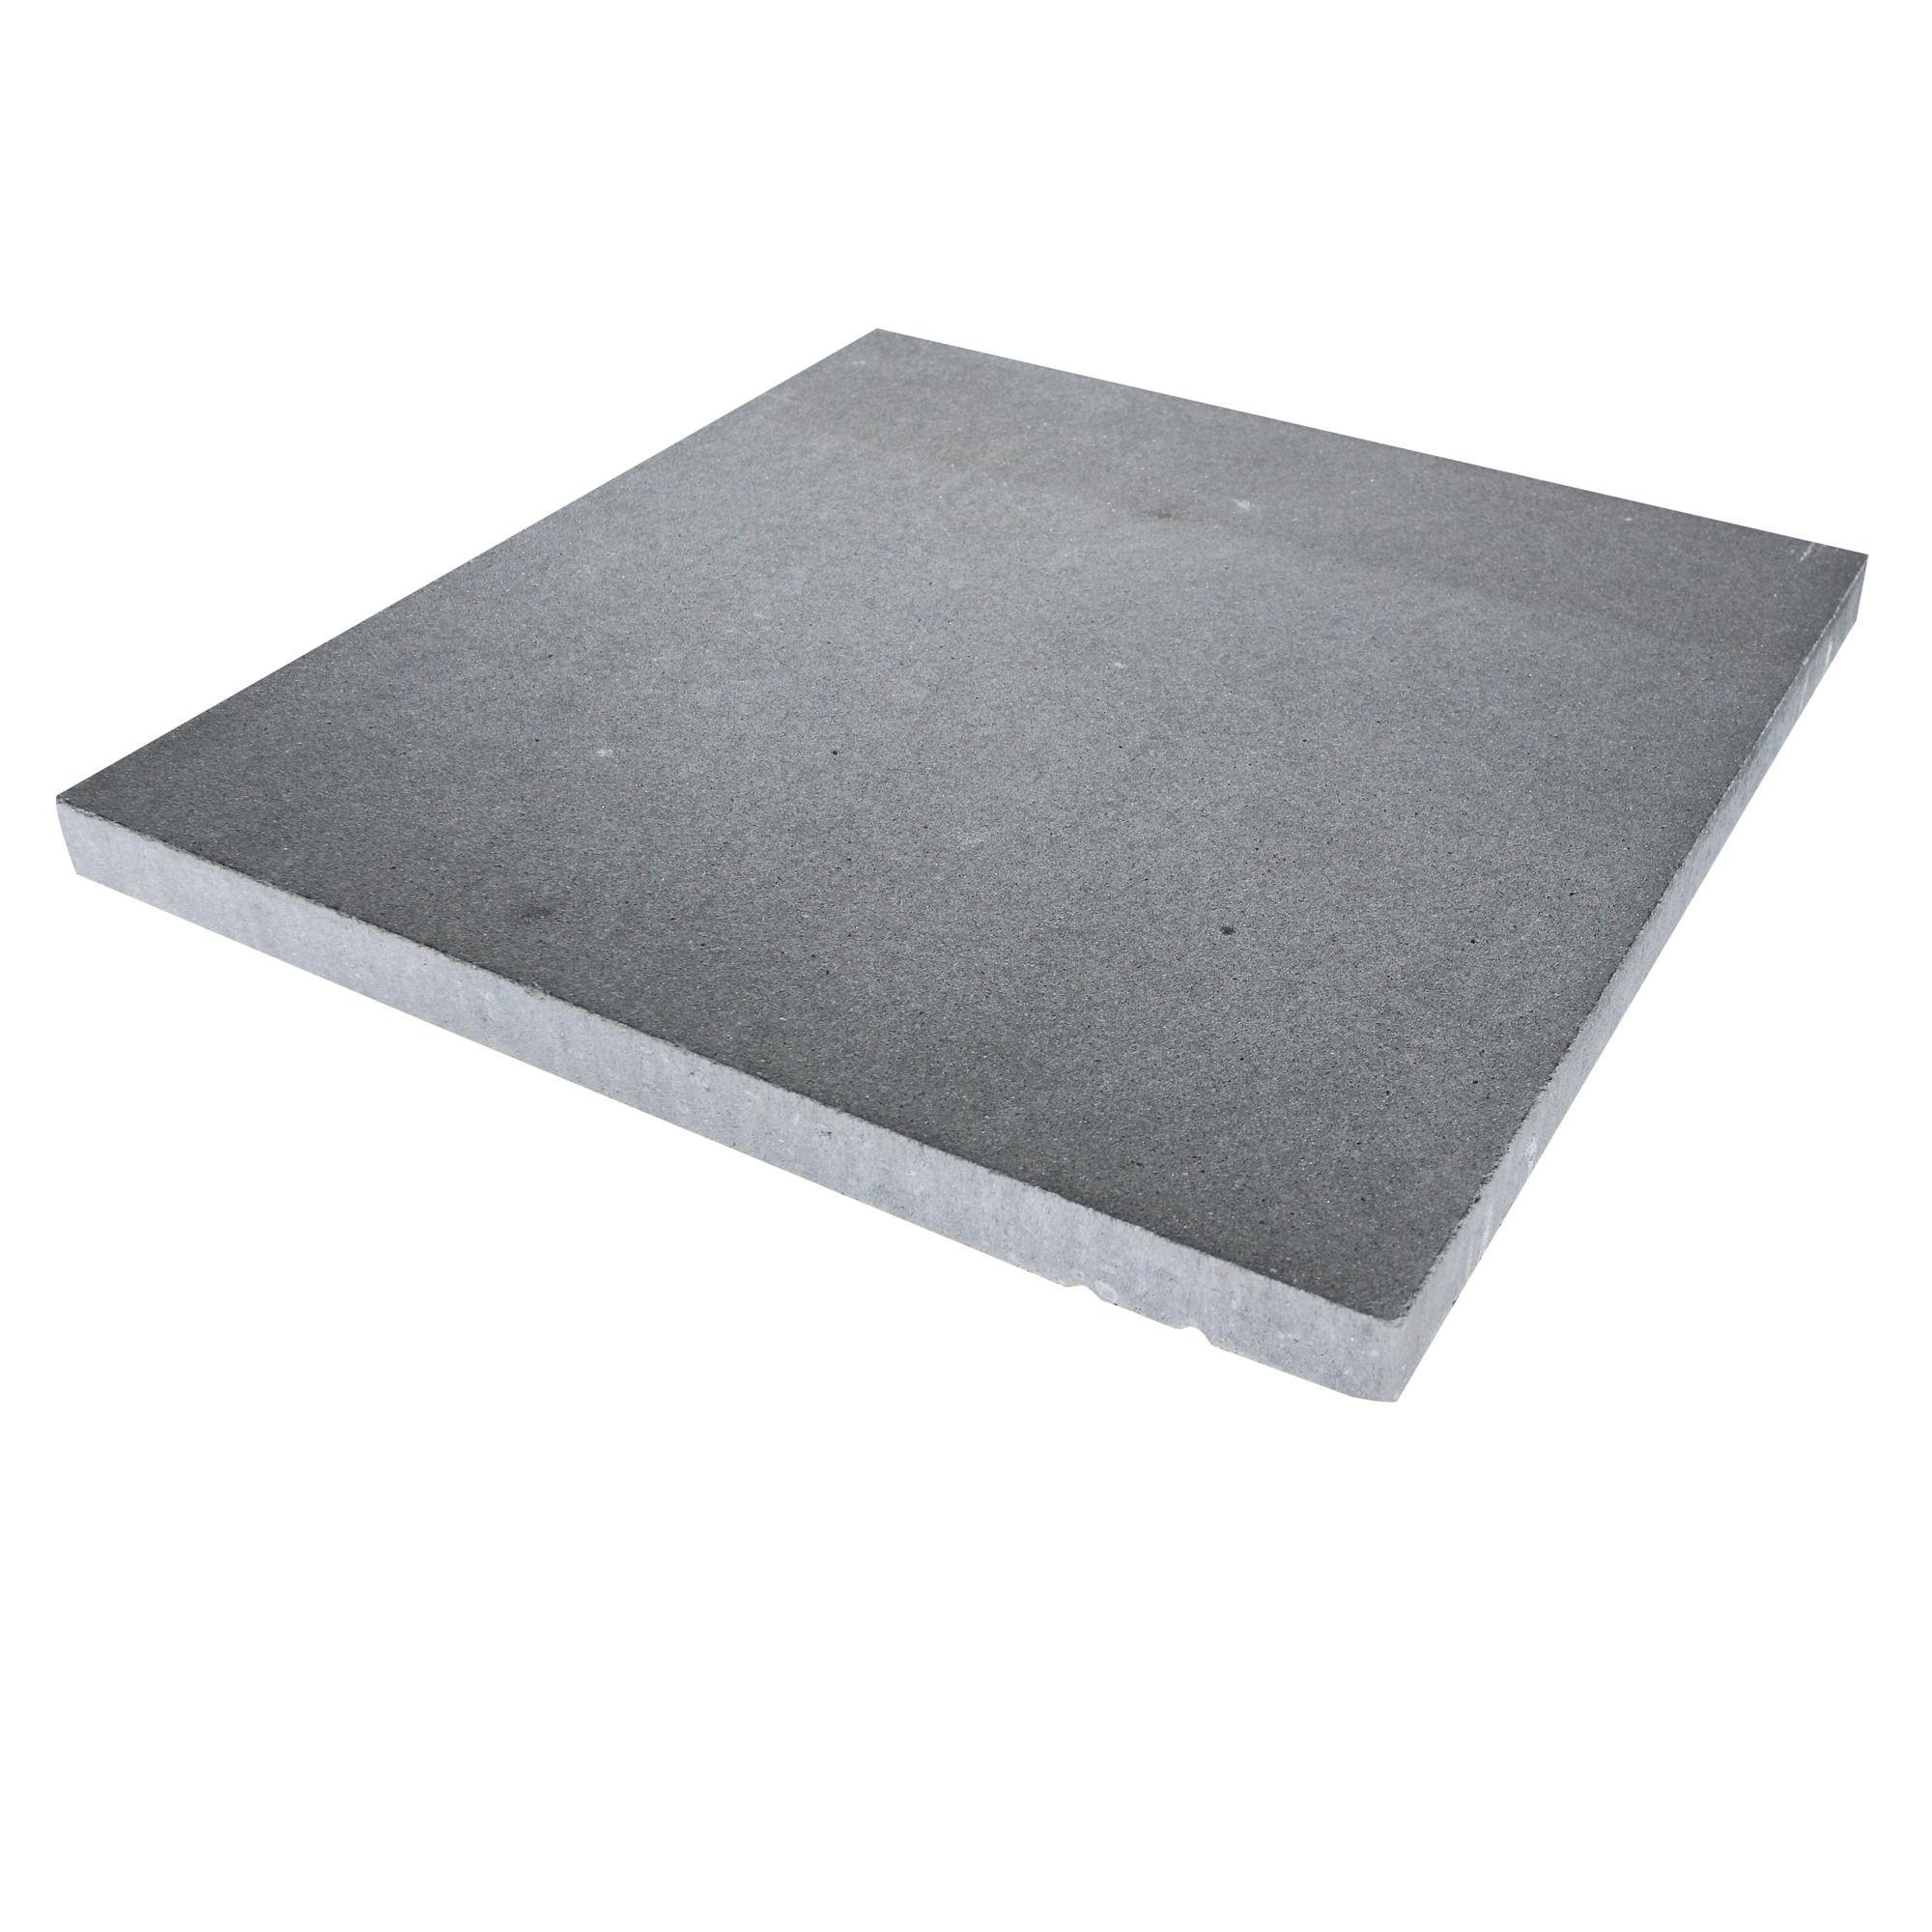 Tuintegels 60x60 Zwart.Terrastegel Beton Vegas Zwart Nuance 60x60 Cm 36 Tegels